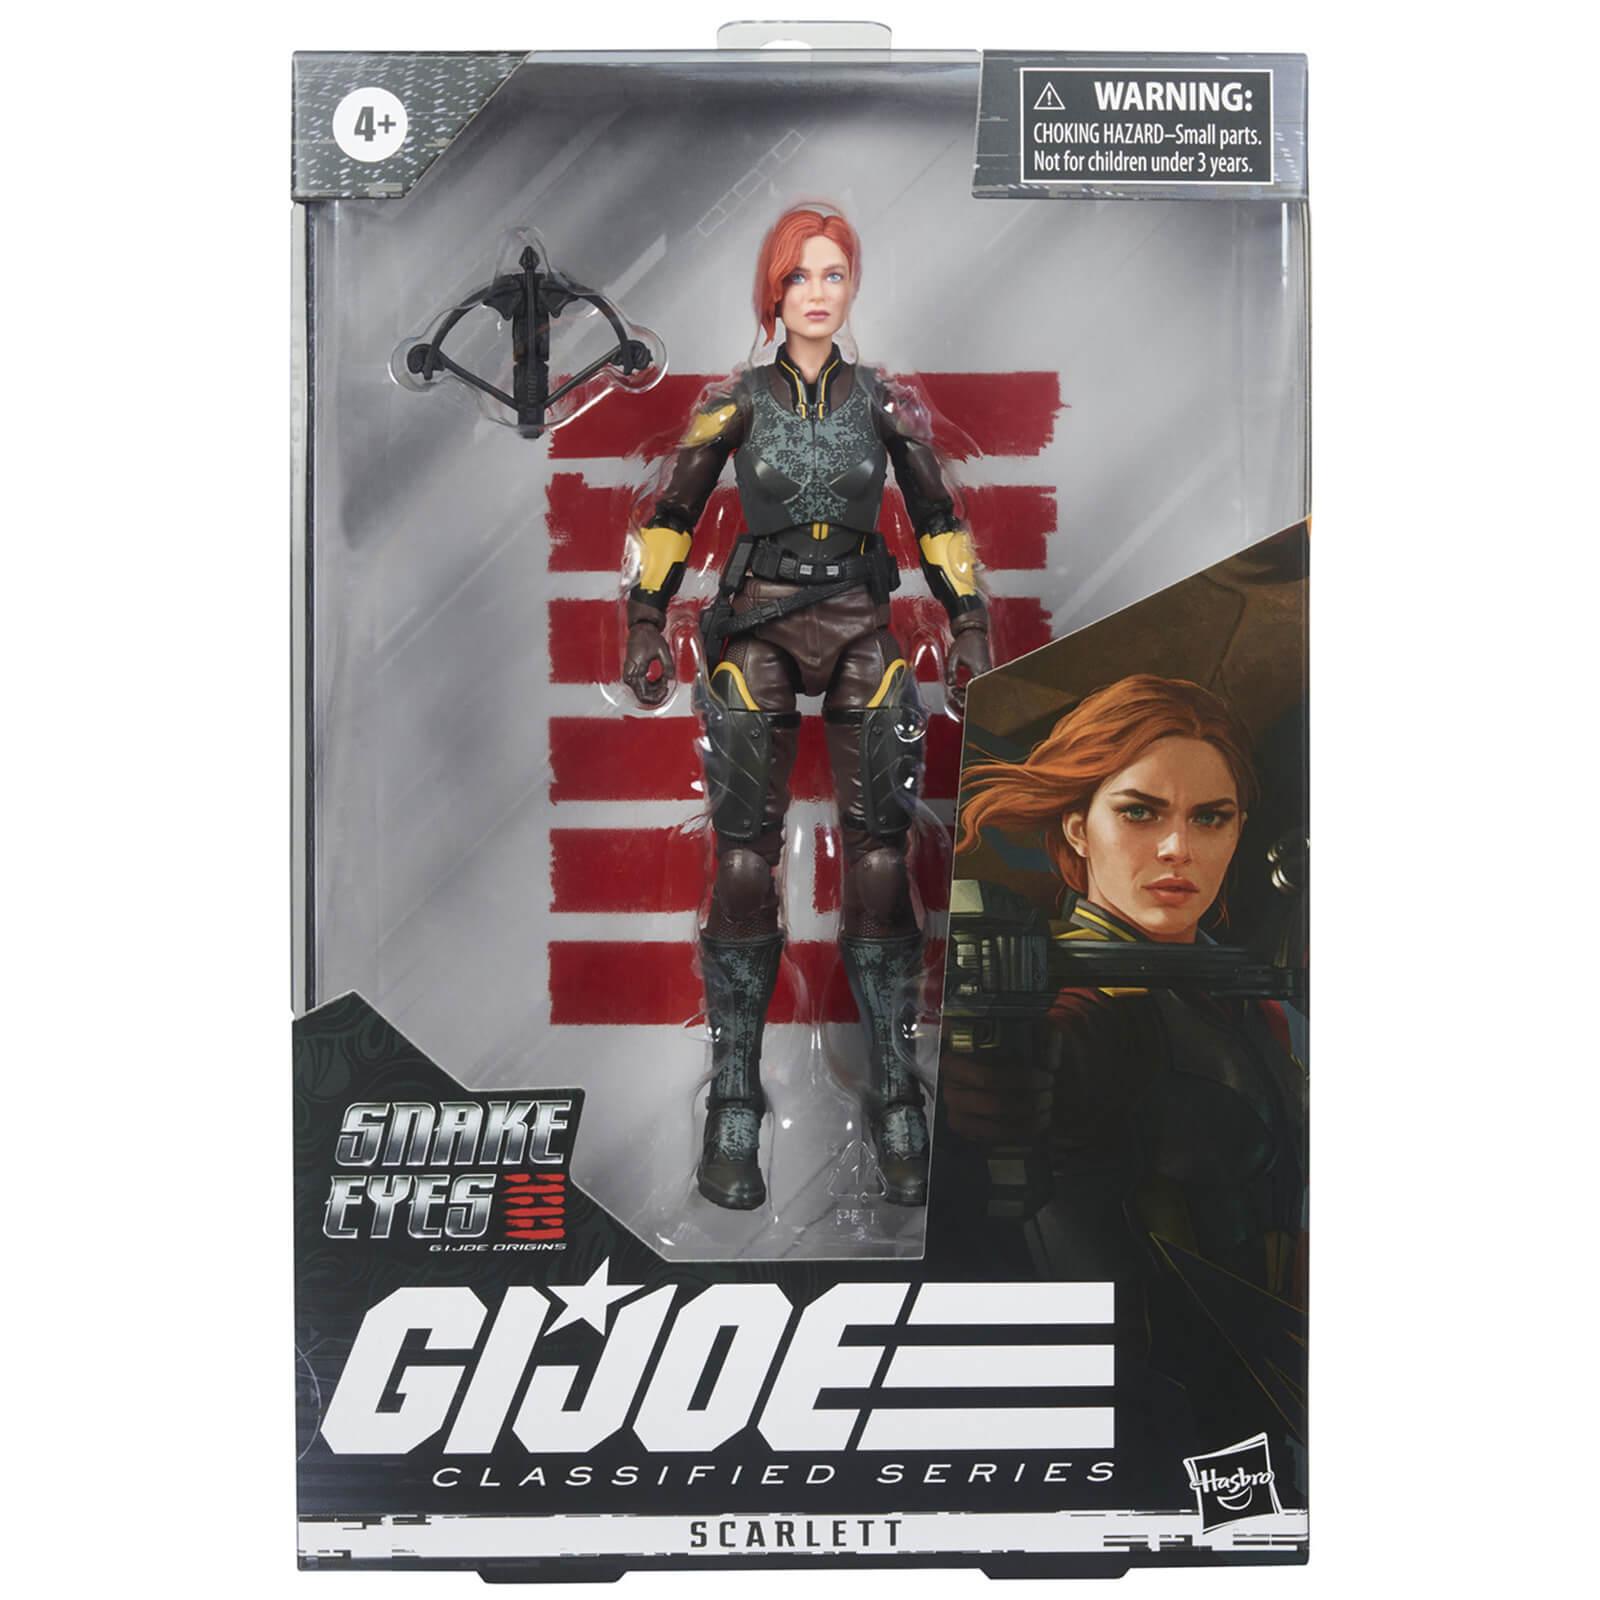 Hasbro G.I. Joe Classified Series Snake Eyes: G.I. Joe Origins Scarlett Action Figure